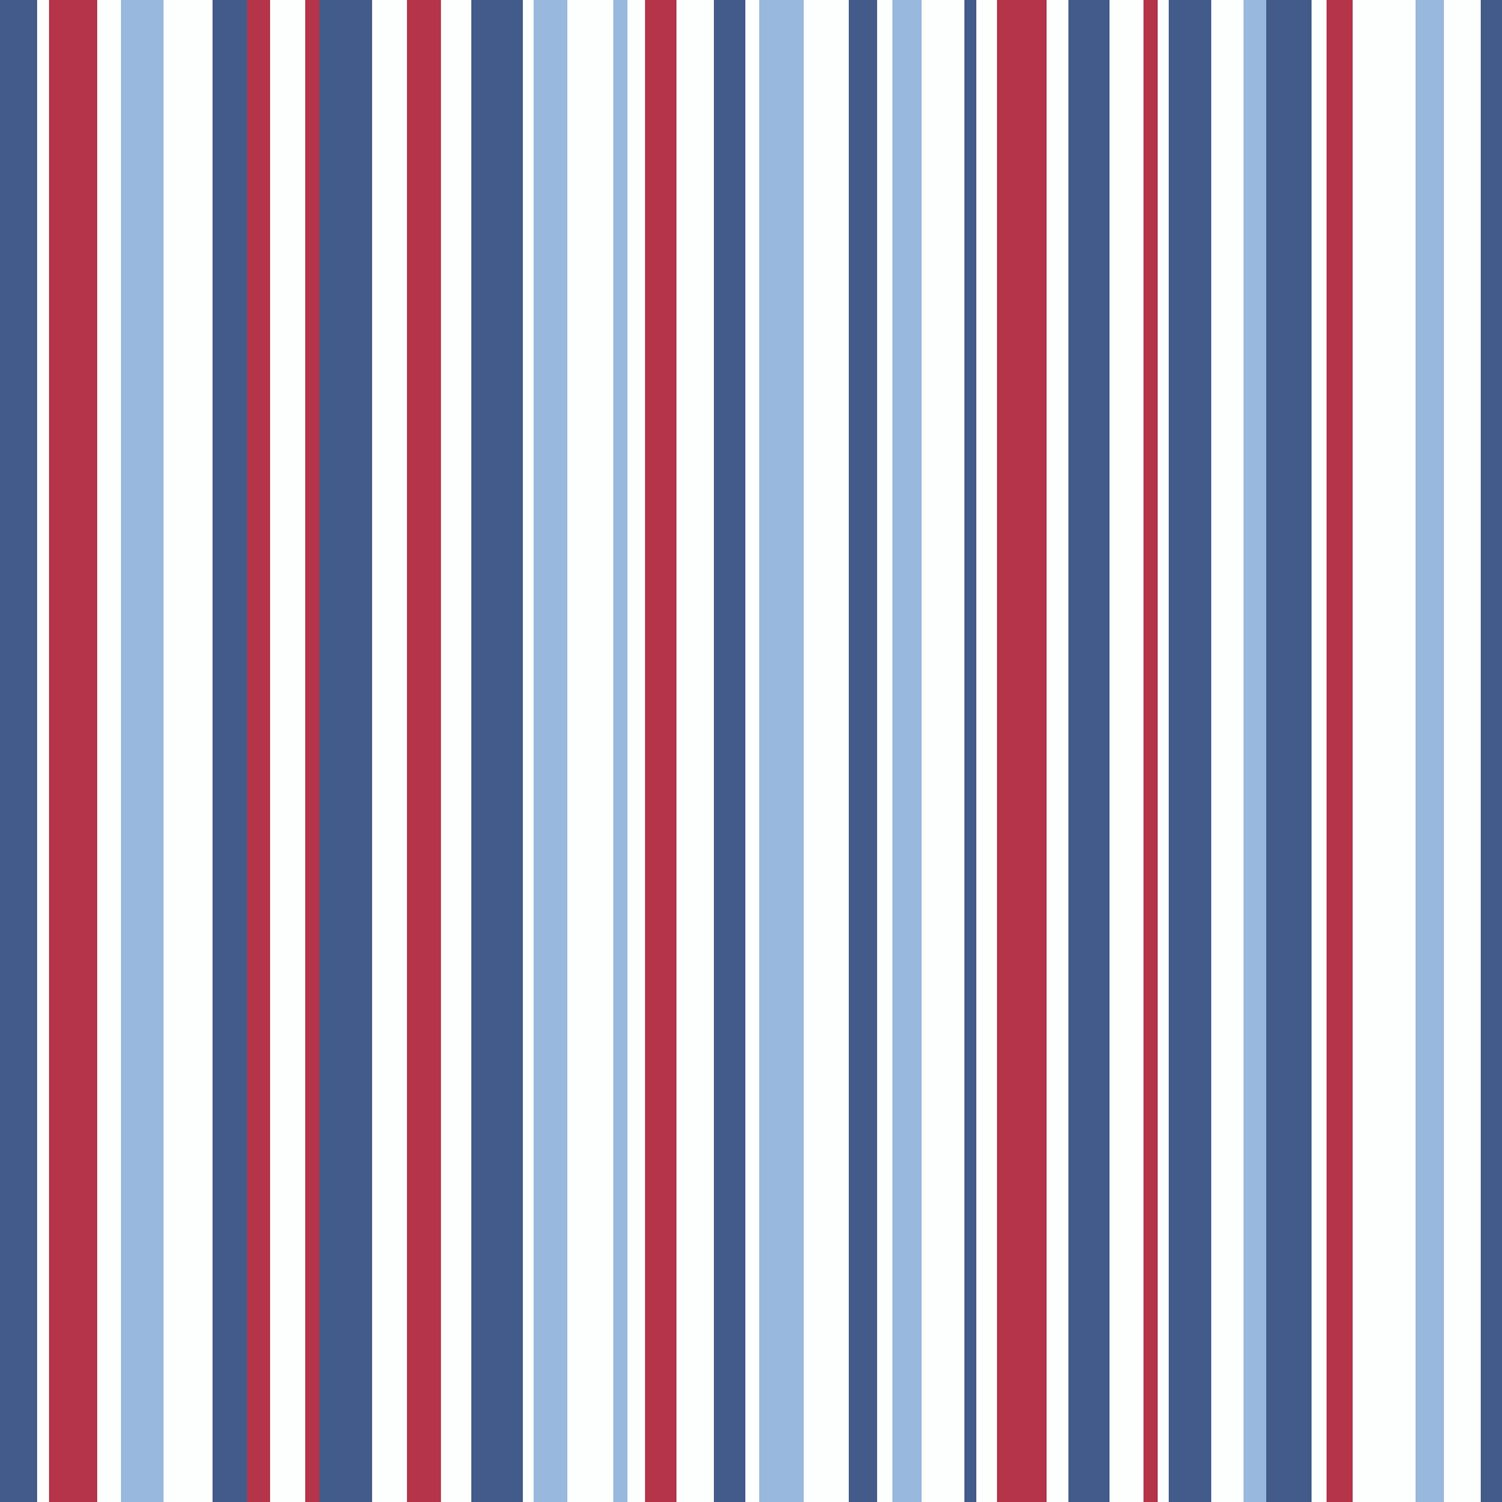 Opera Fun, Super Stripe 533602 by Arthouse Red, white